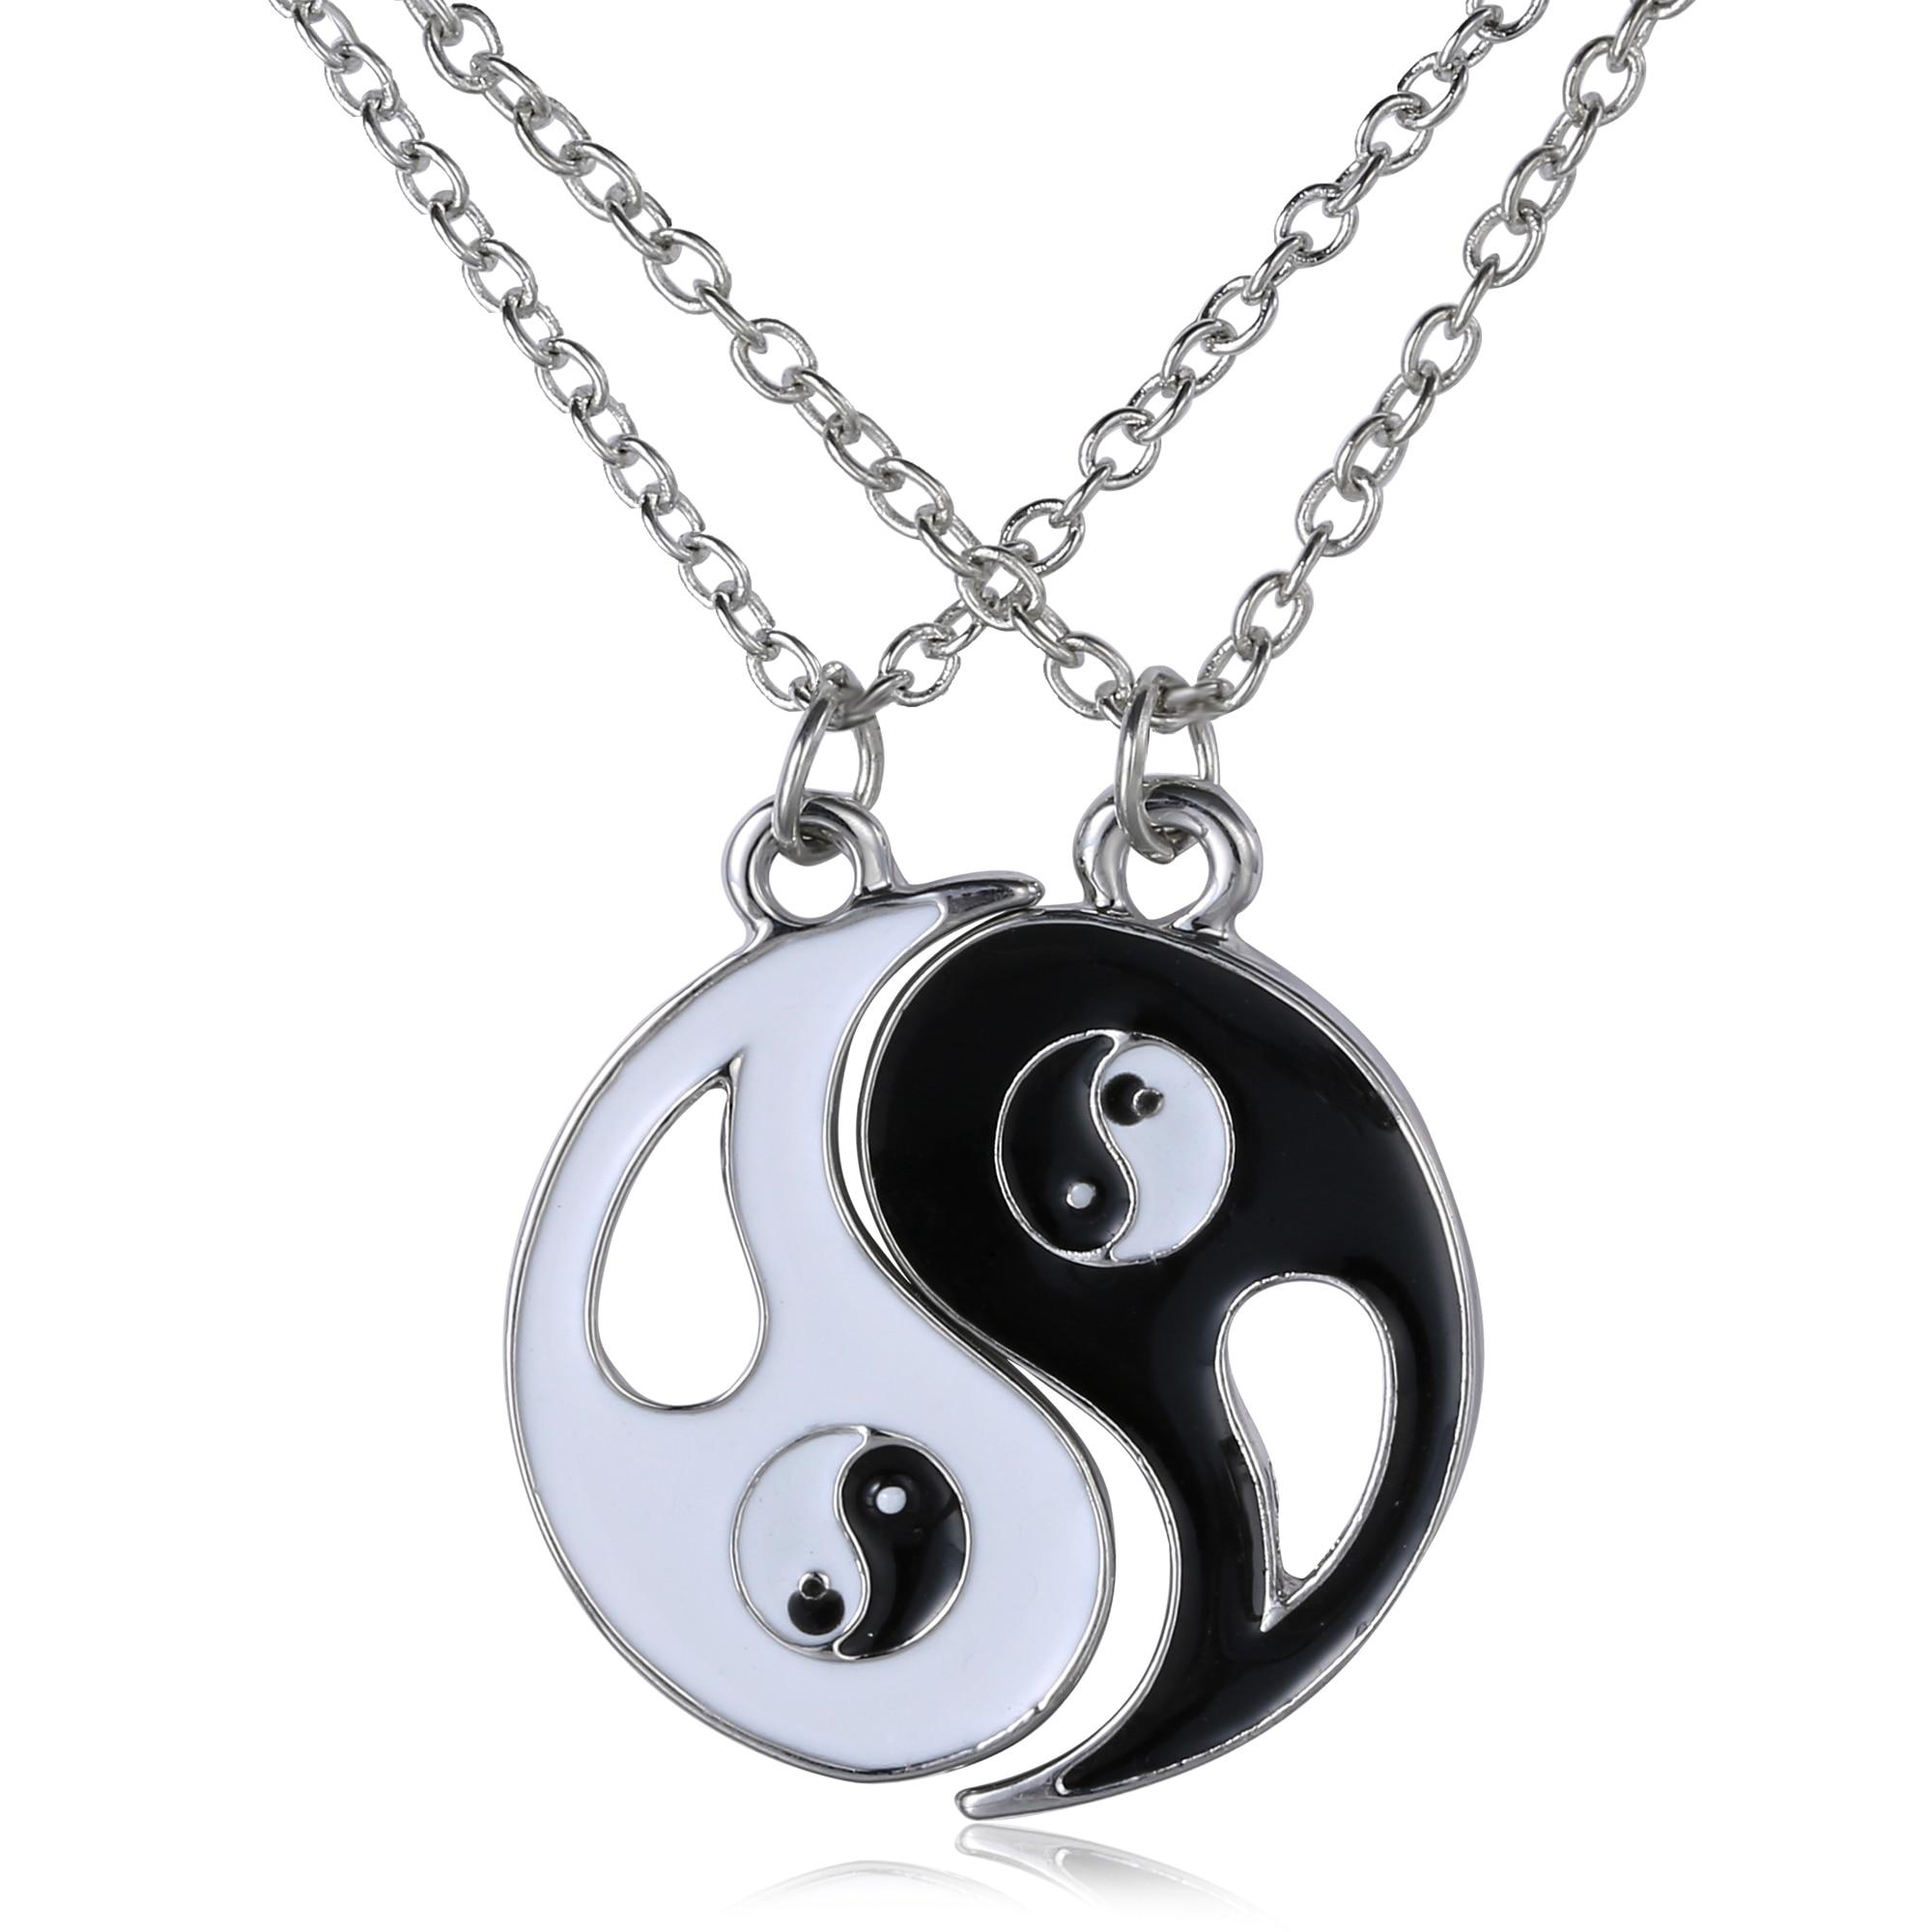 2P Yin Yang κολιέ κρεμαστό κόσμημα μαύρο άσπρο ζευγάρι αδελφή φίλο φιλίας κοσμήματα μοναδικά εξατομικευμένα δώρα